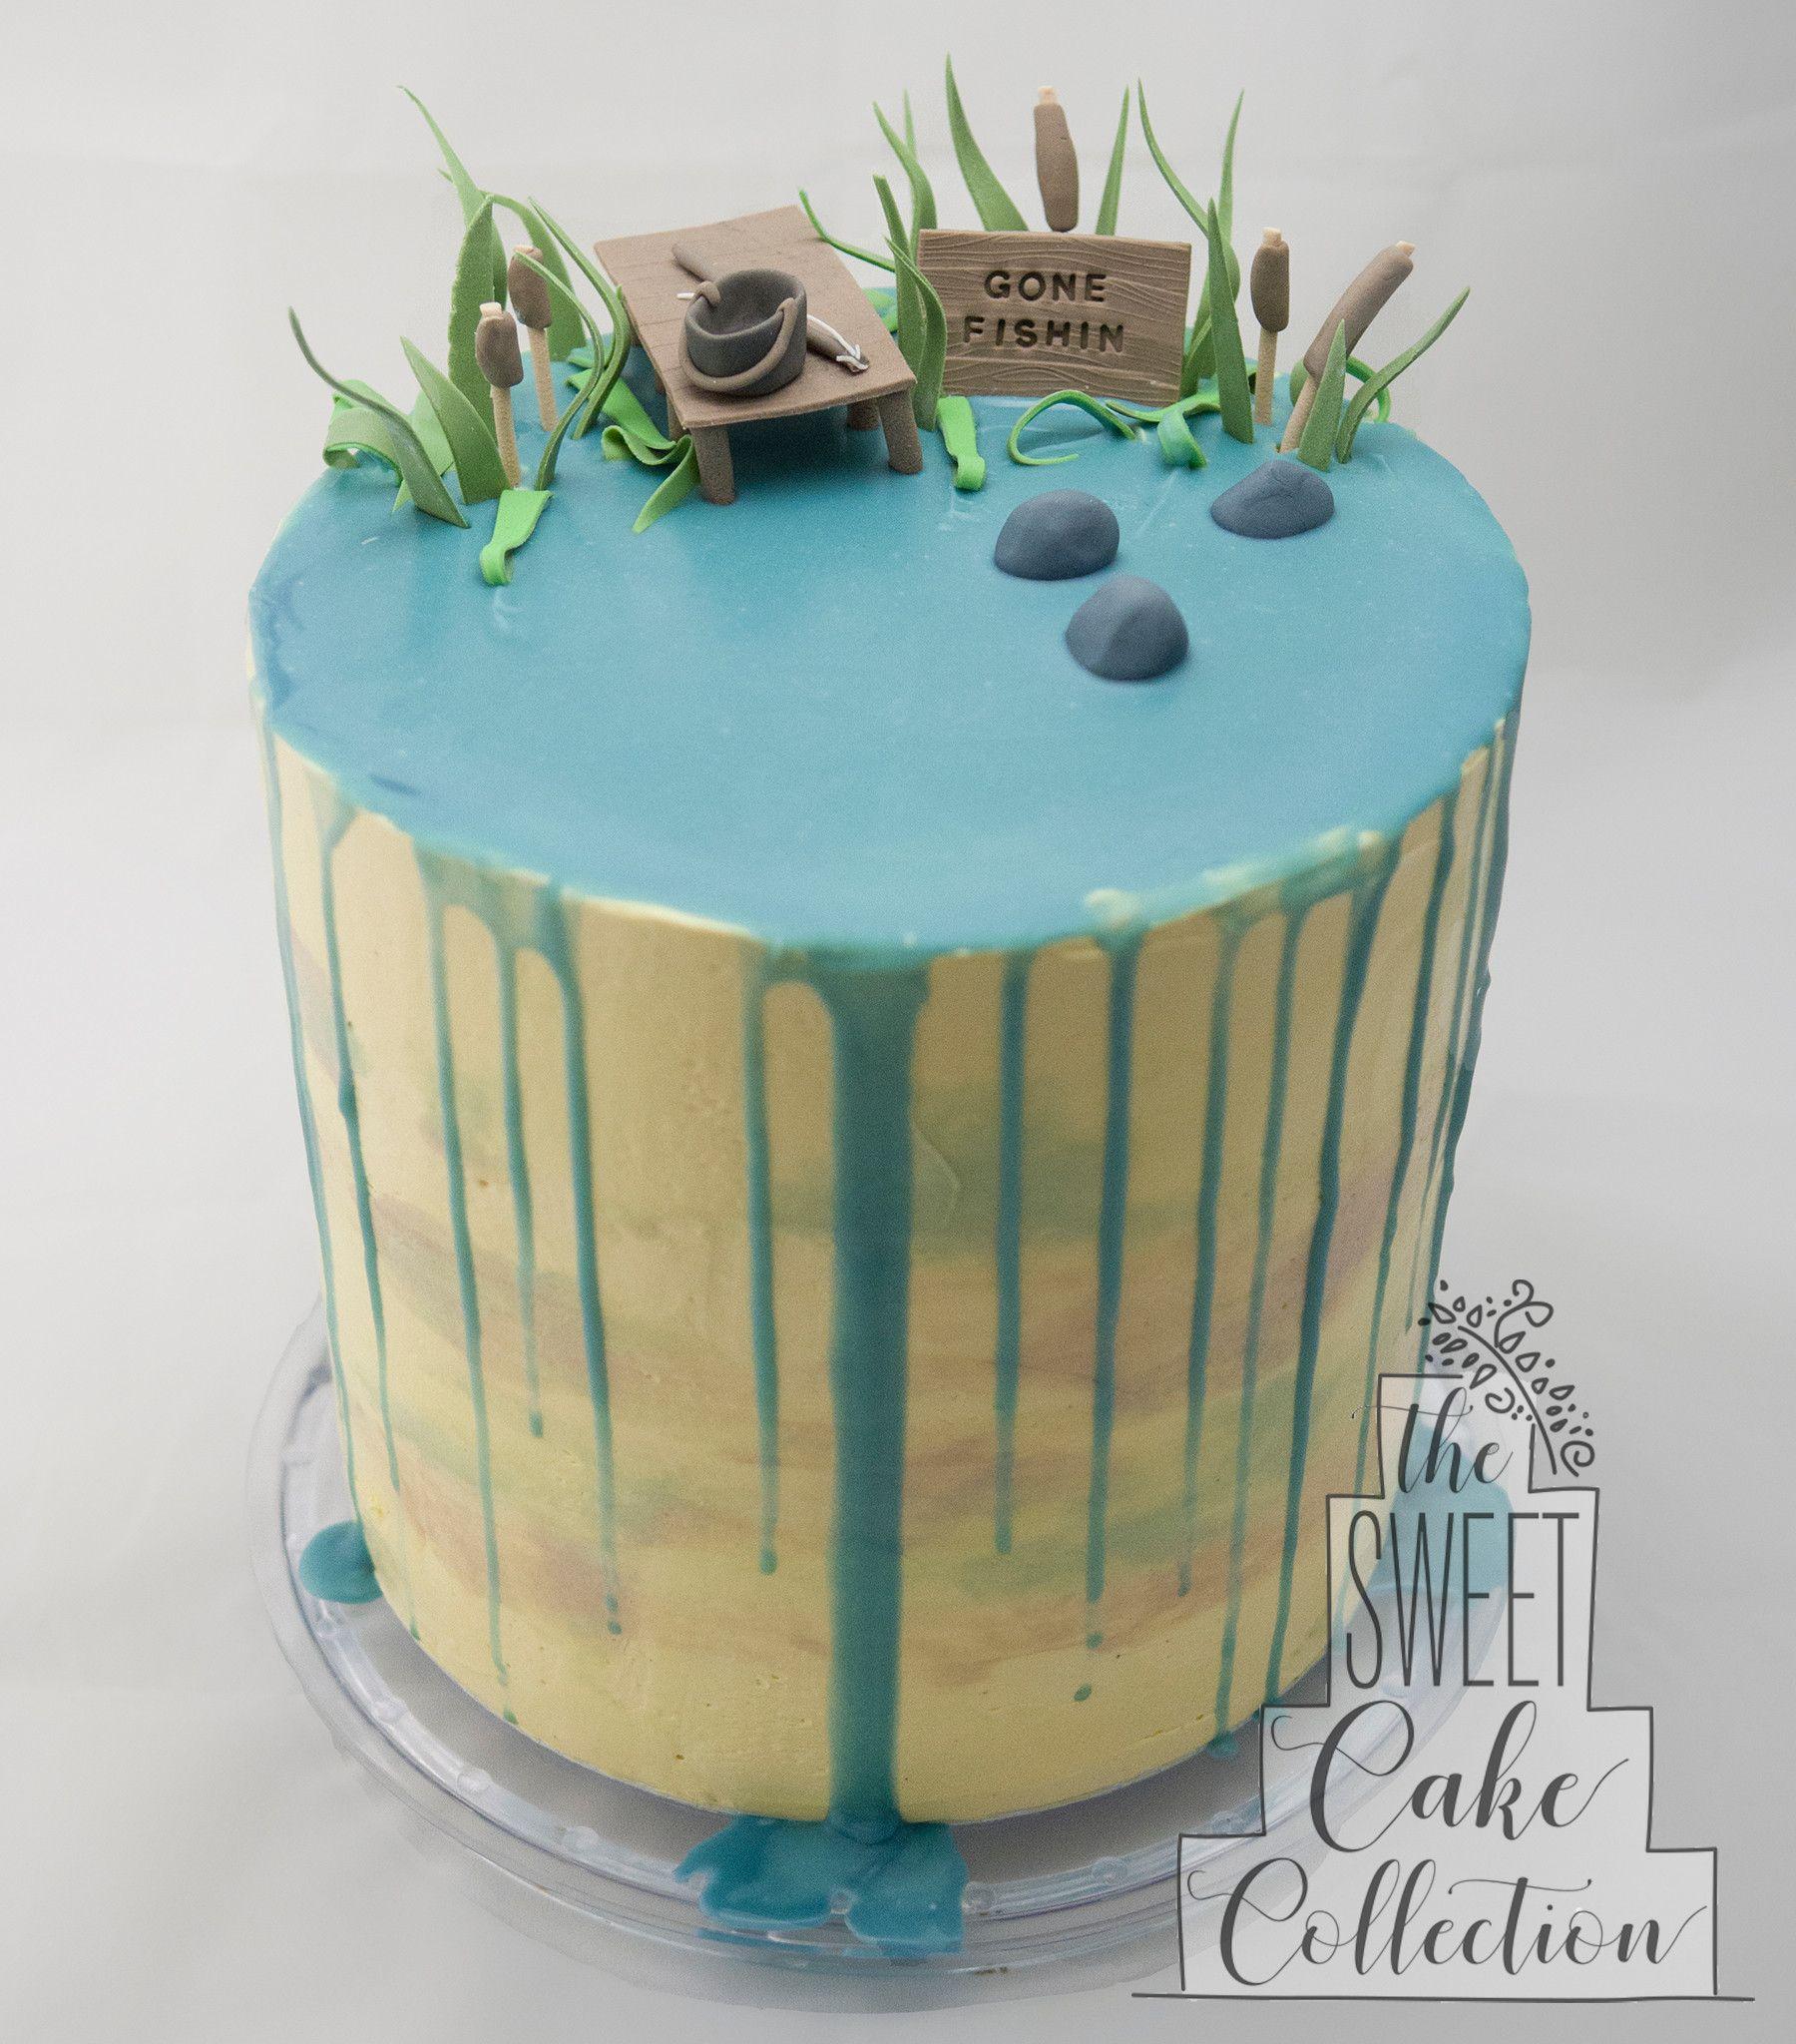 Gone fishin cake birthday cakes for men drip cakes cake